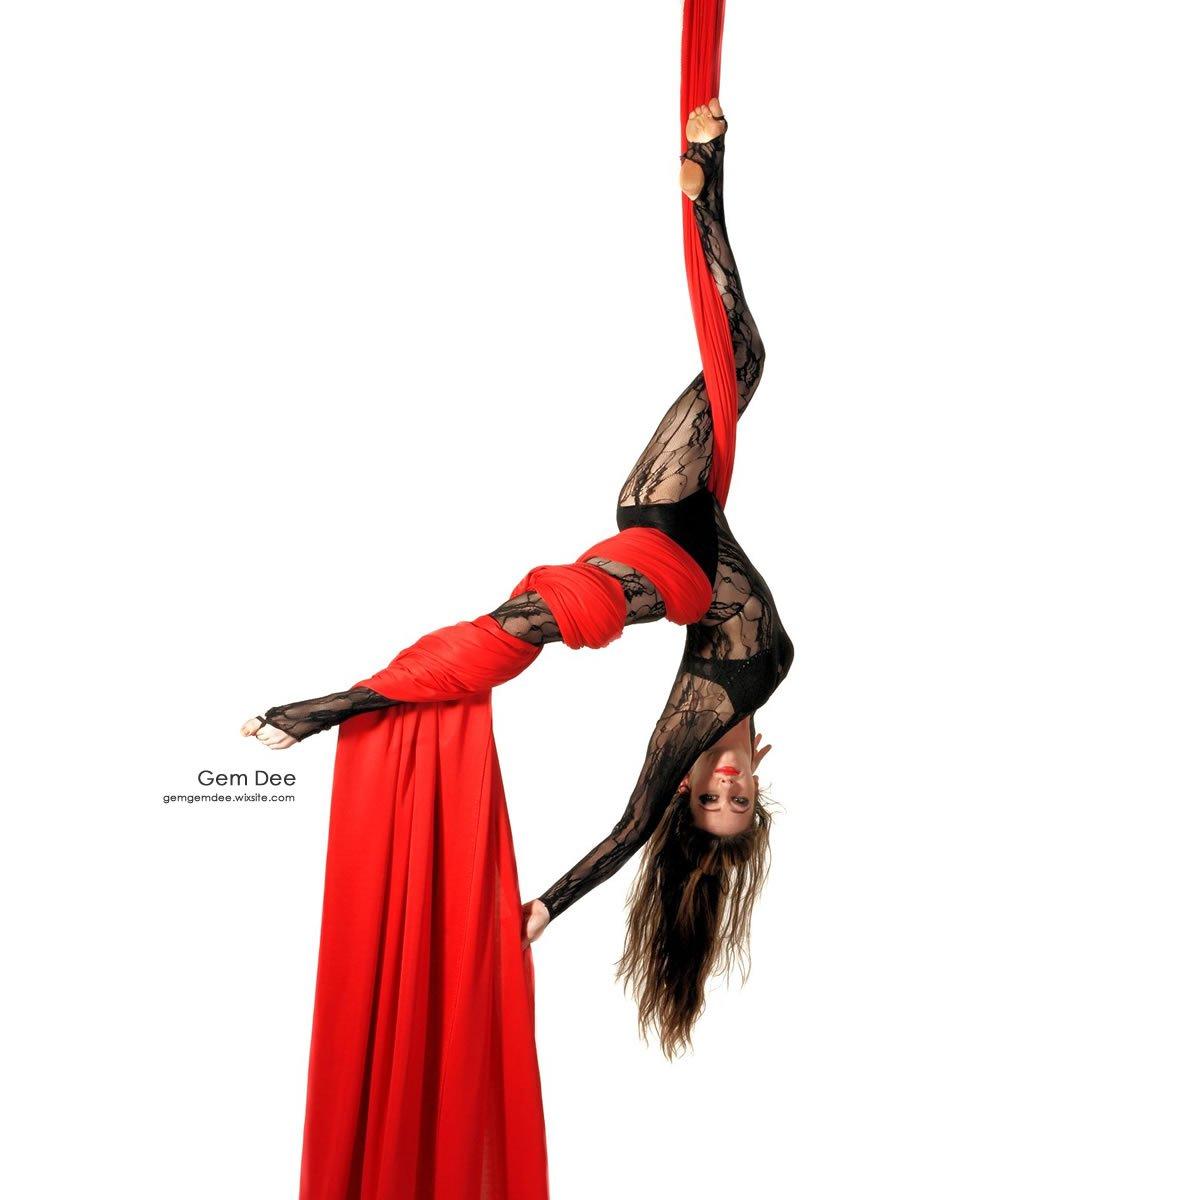 Firetoys Aerial Silk (Aerial Fabric Fabric (Aerial / Tissus) - ROT-10 metres 2028ac